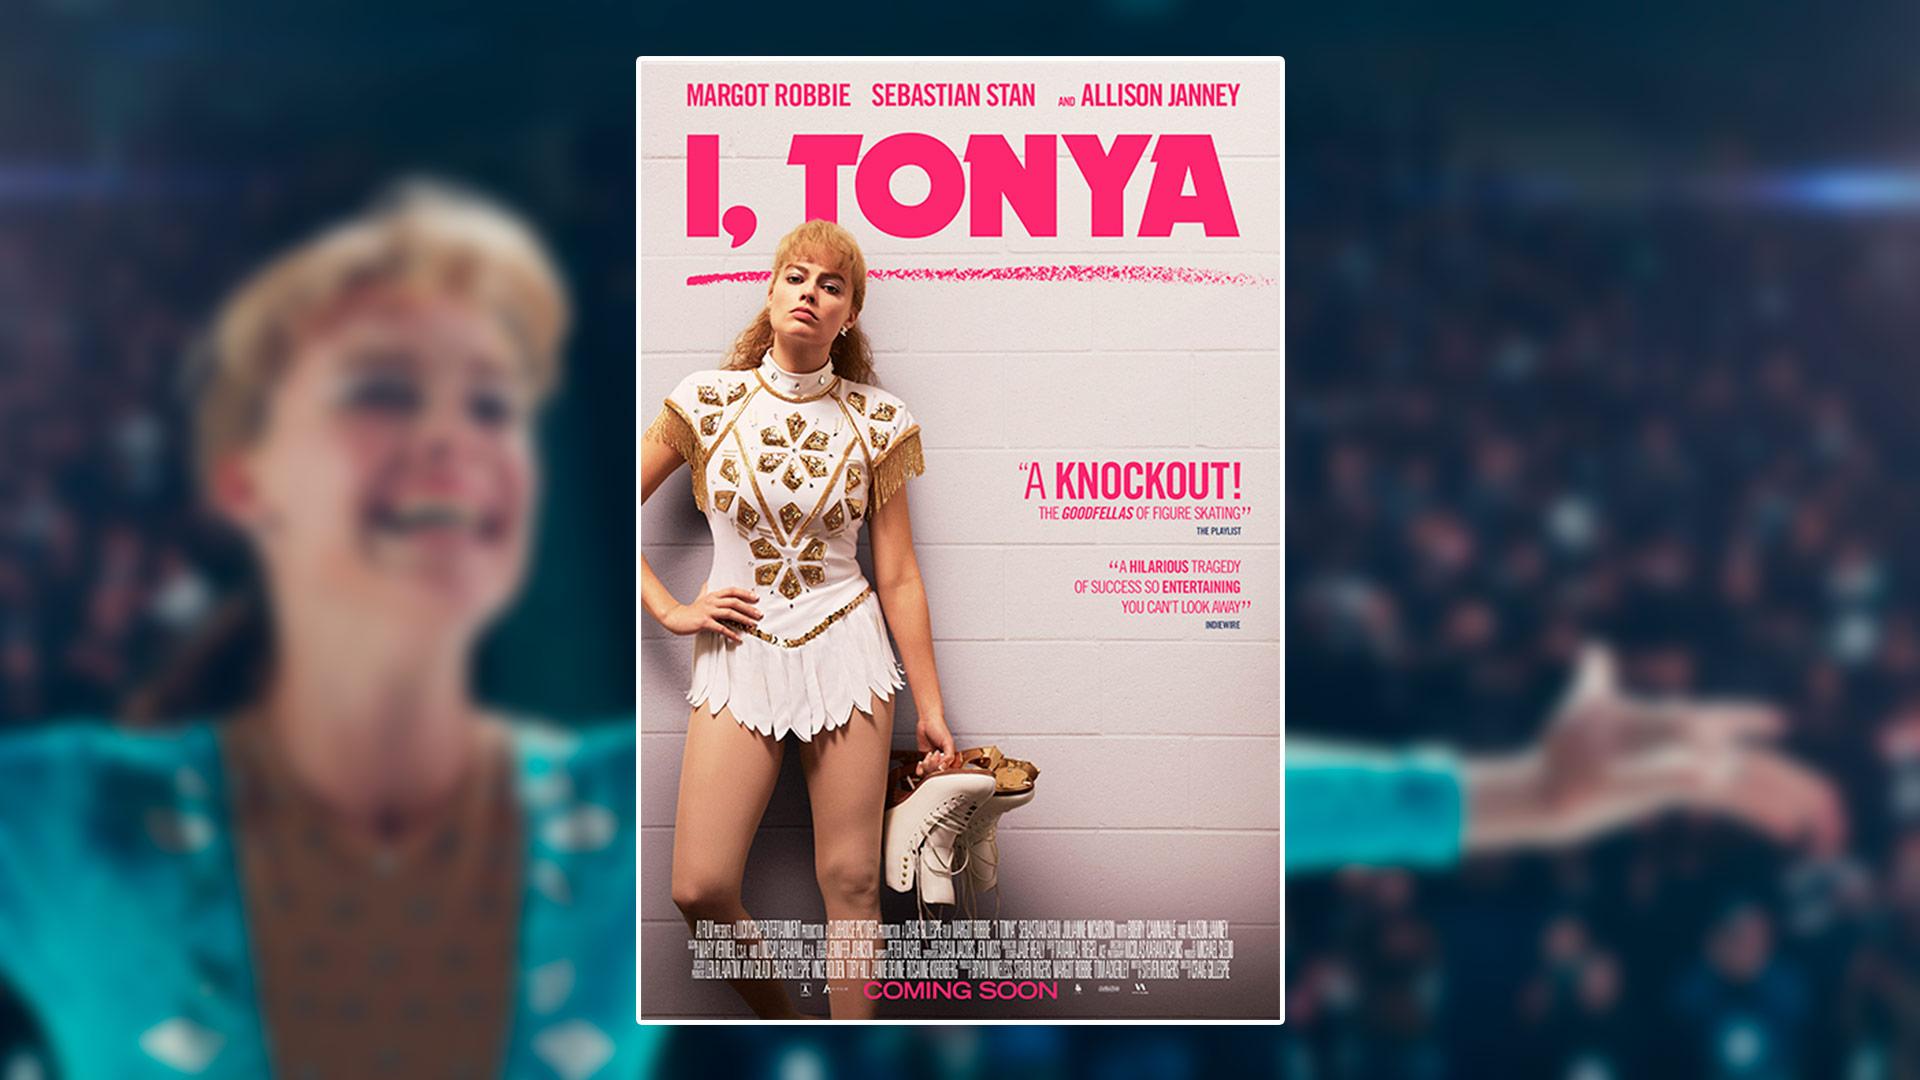 Critique du film I, Tonya avec Margot Robbie